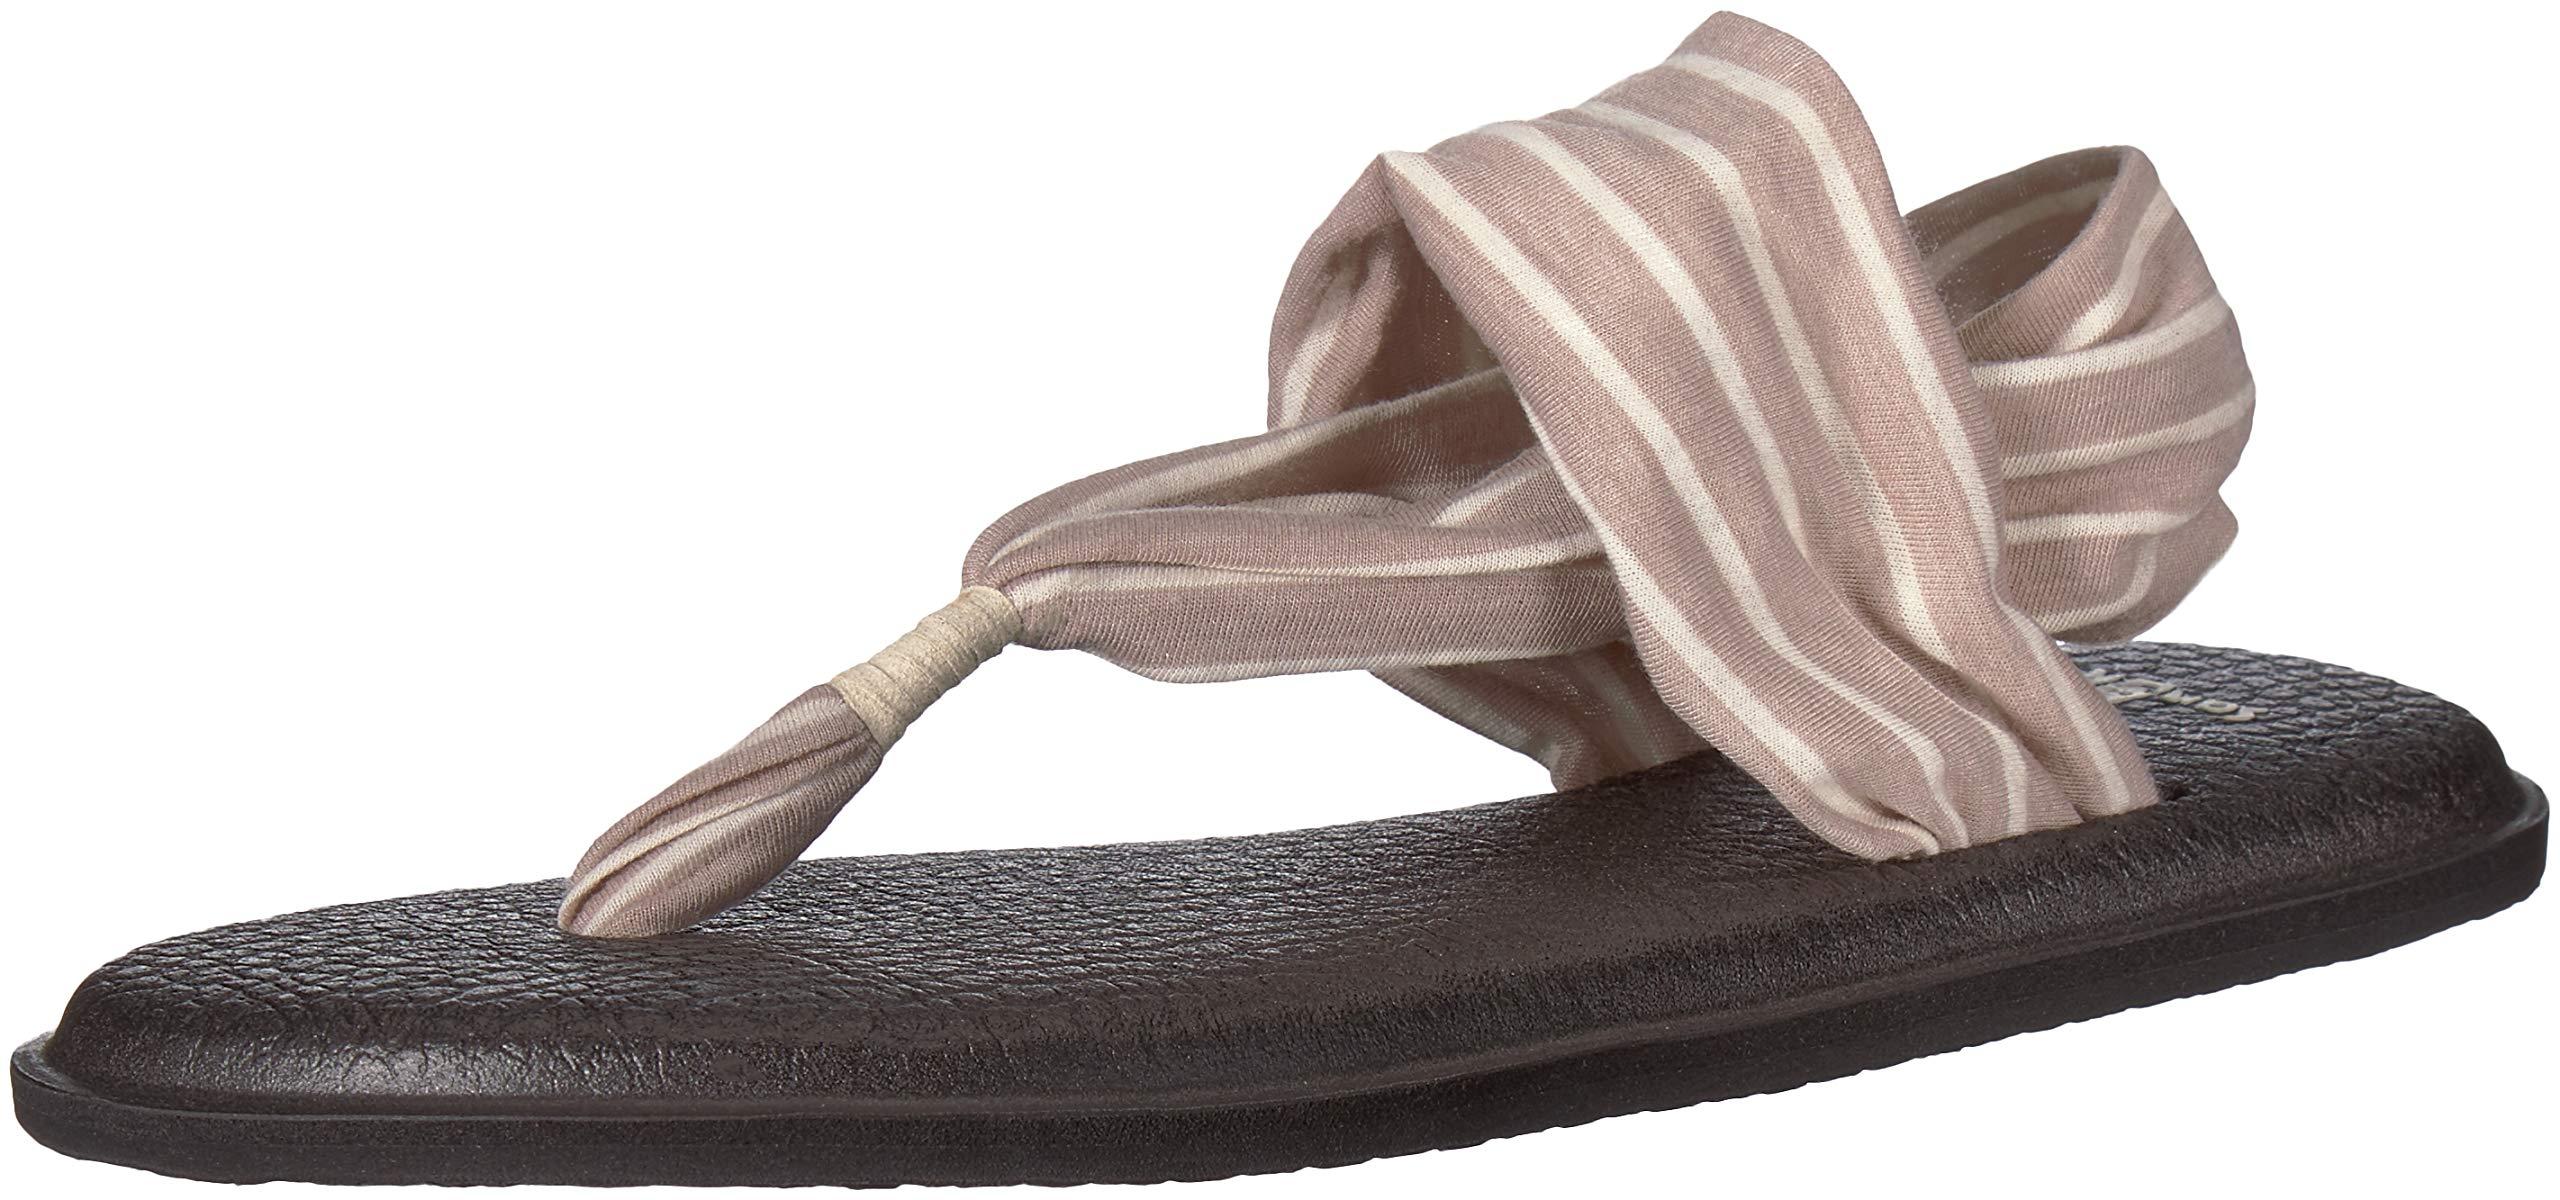 Sanuk Women's Yoga Sling 2 Prints Flip Flop,Tan/Natural Stripes,5 M US